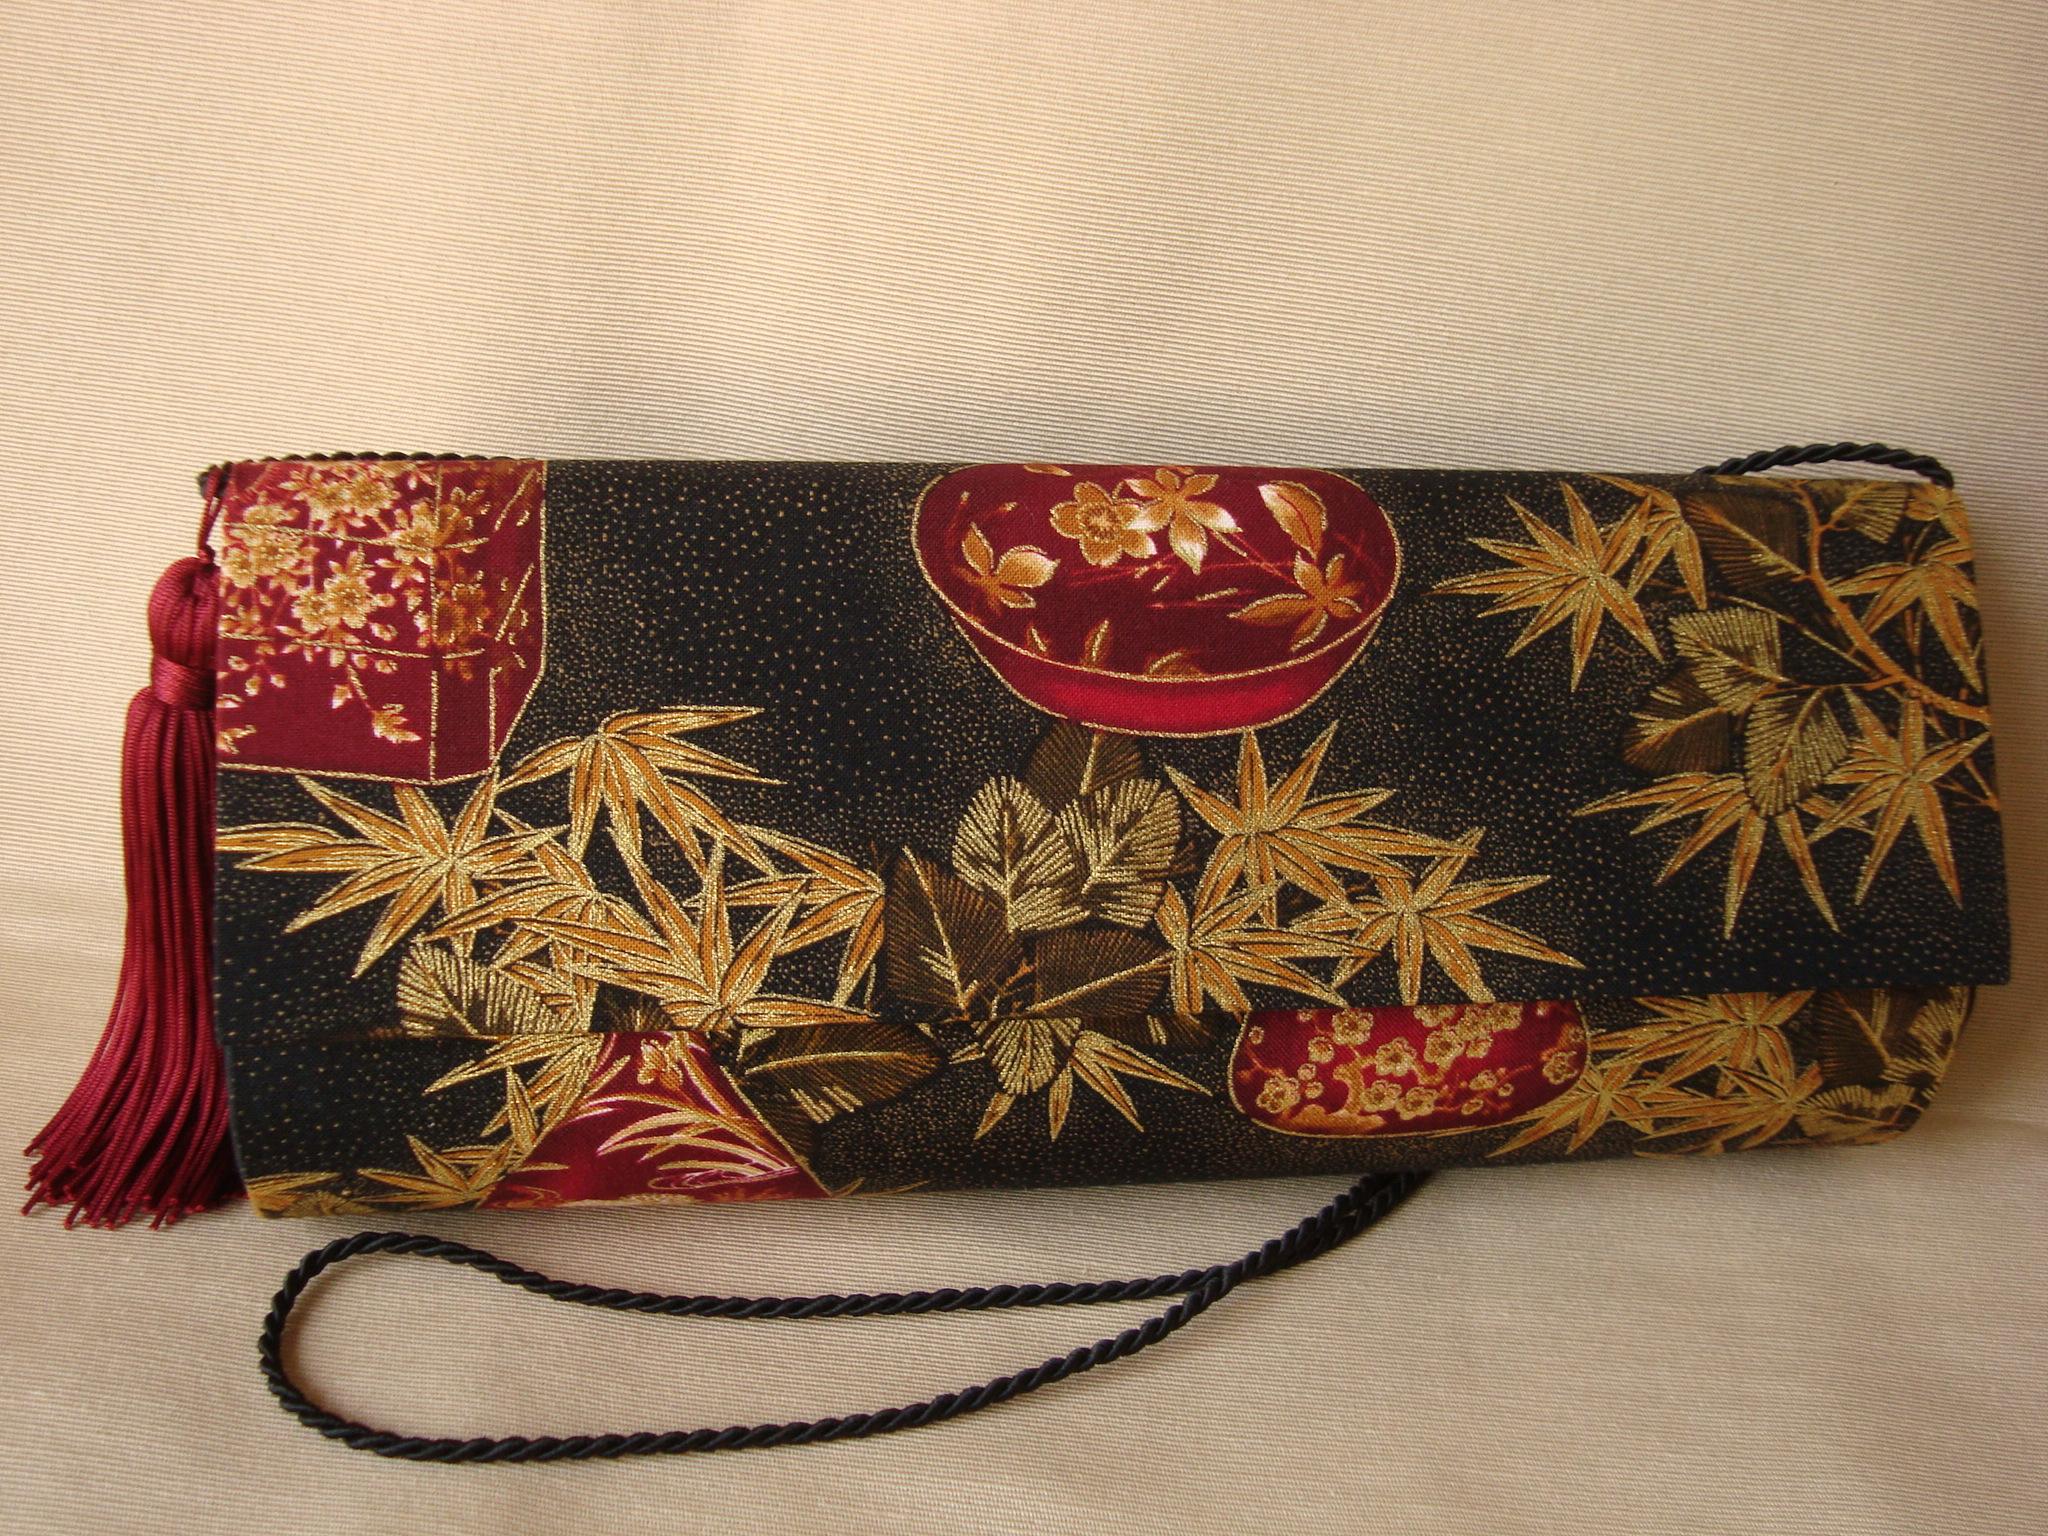 Bolsa De Tecido Forrada : Bolsa oriental maria cl?udia artesanato elo